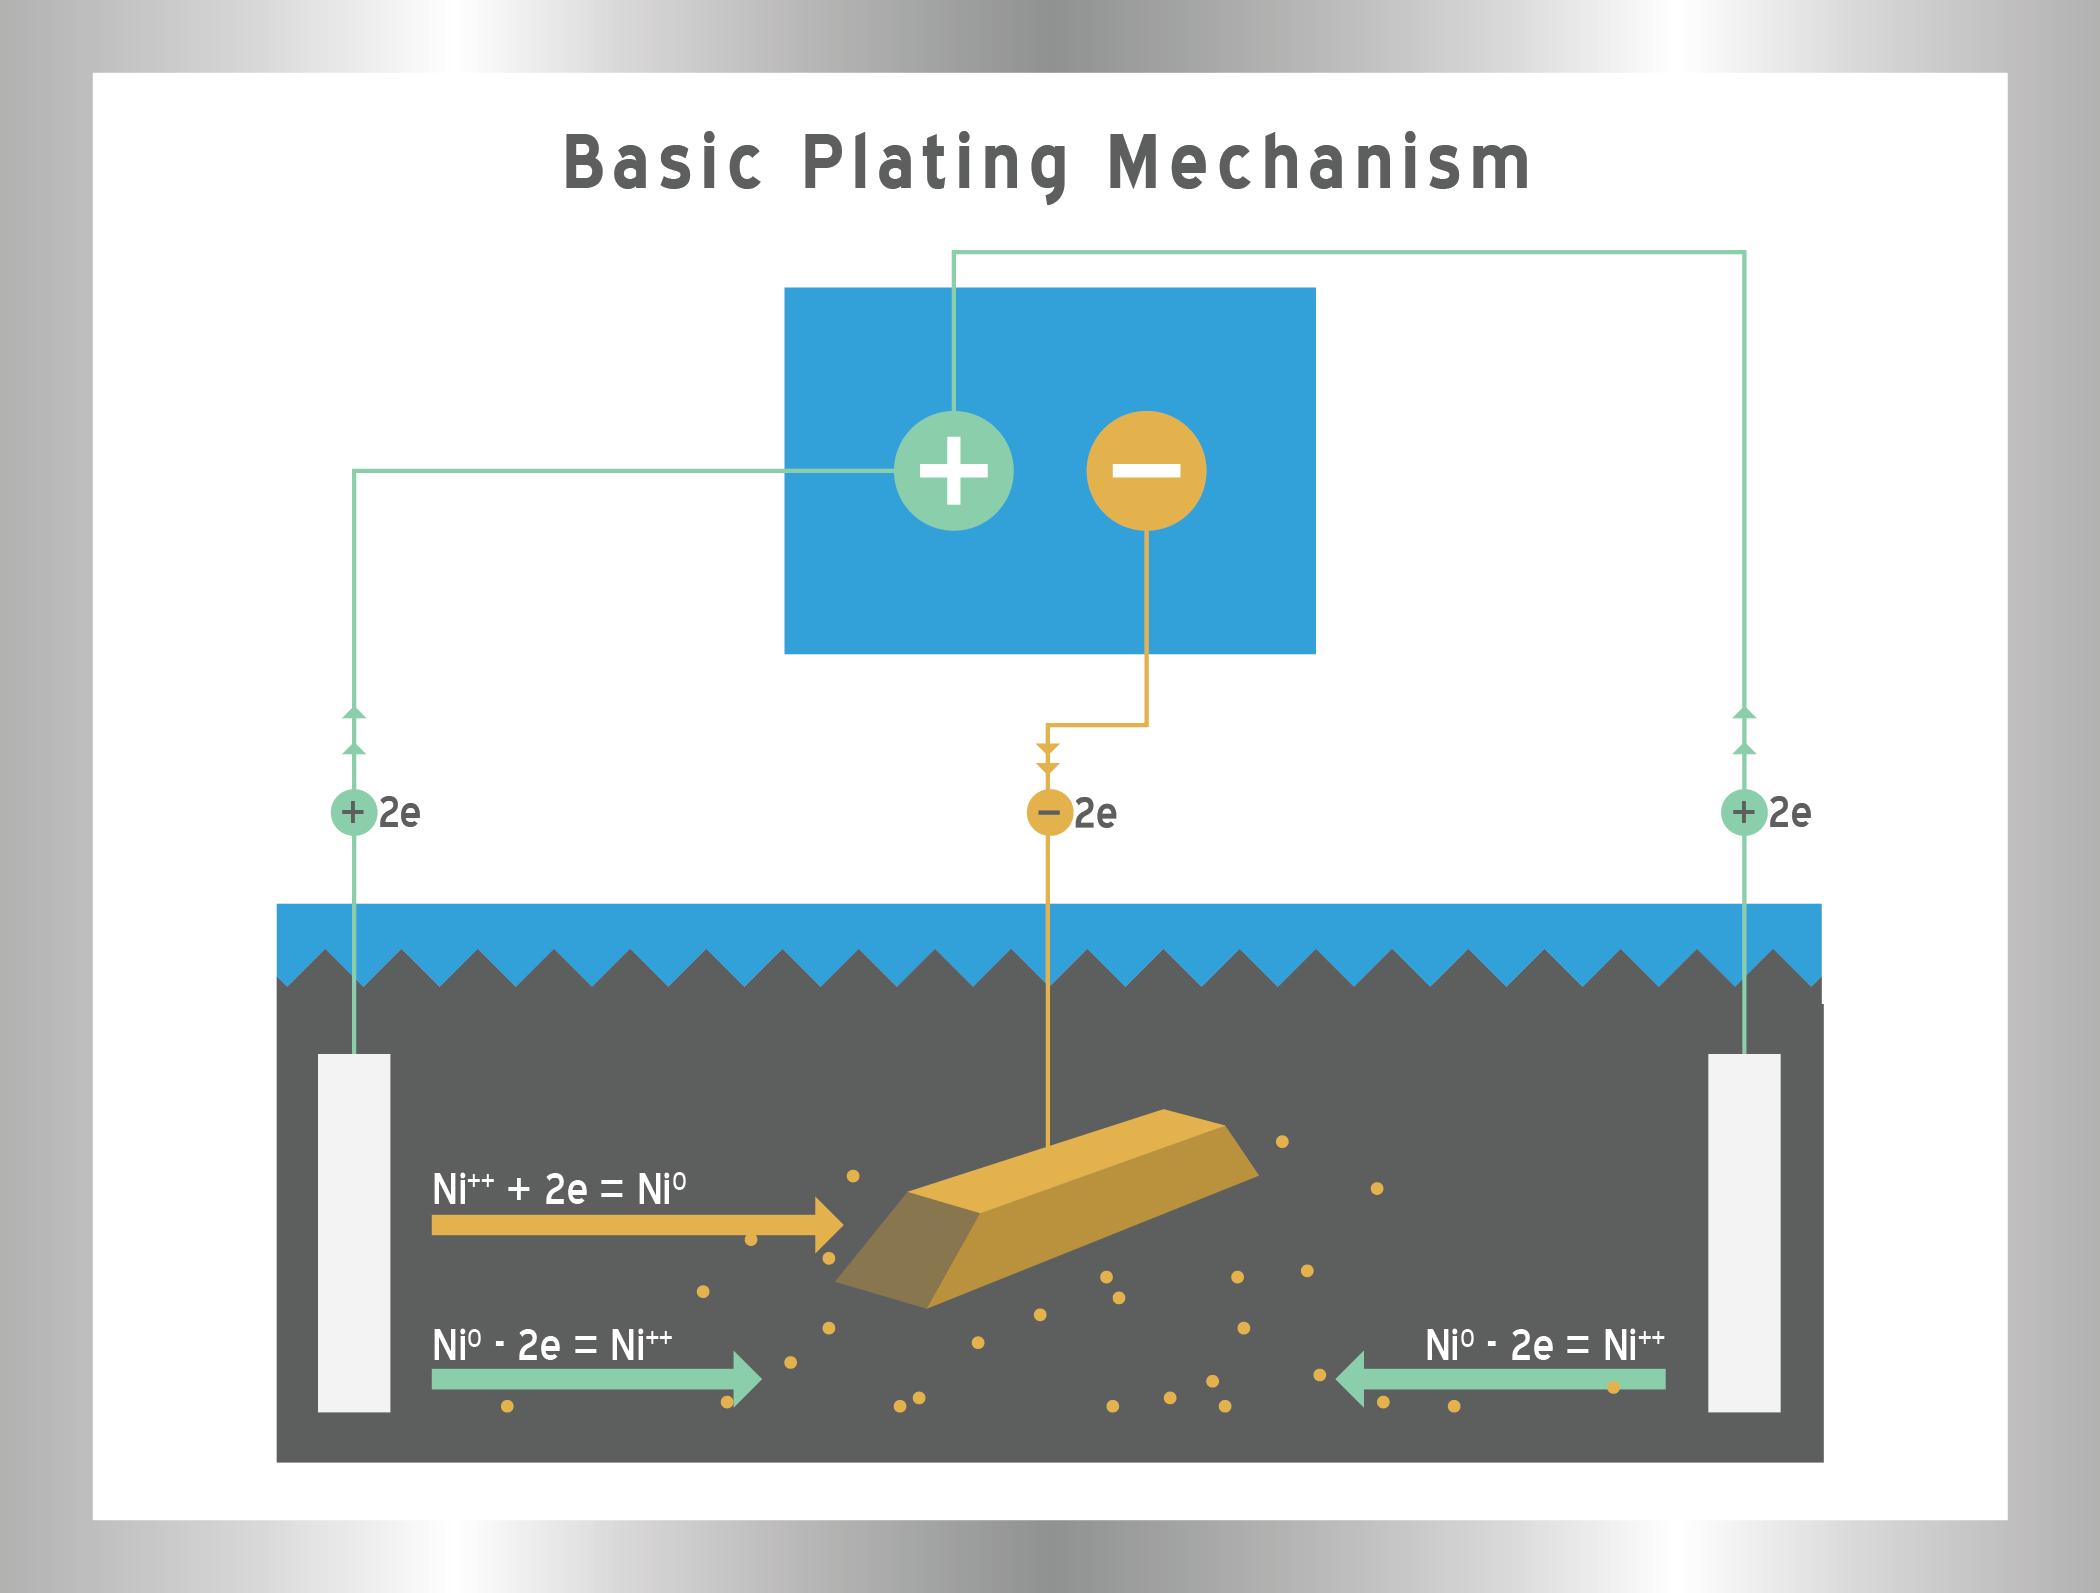 Basic Plating Mechanism Graphic - Klein Plating Works